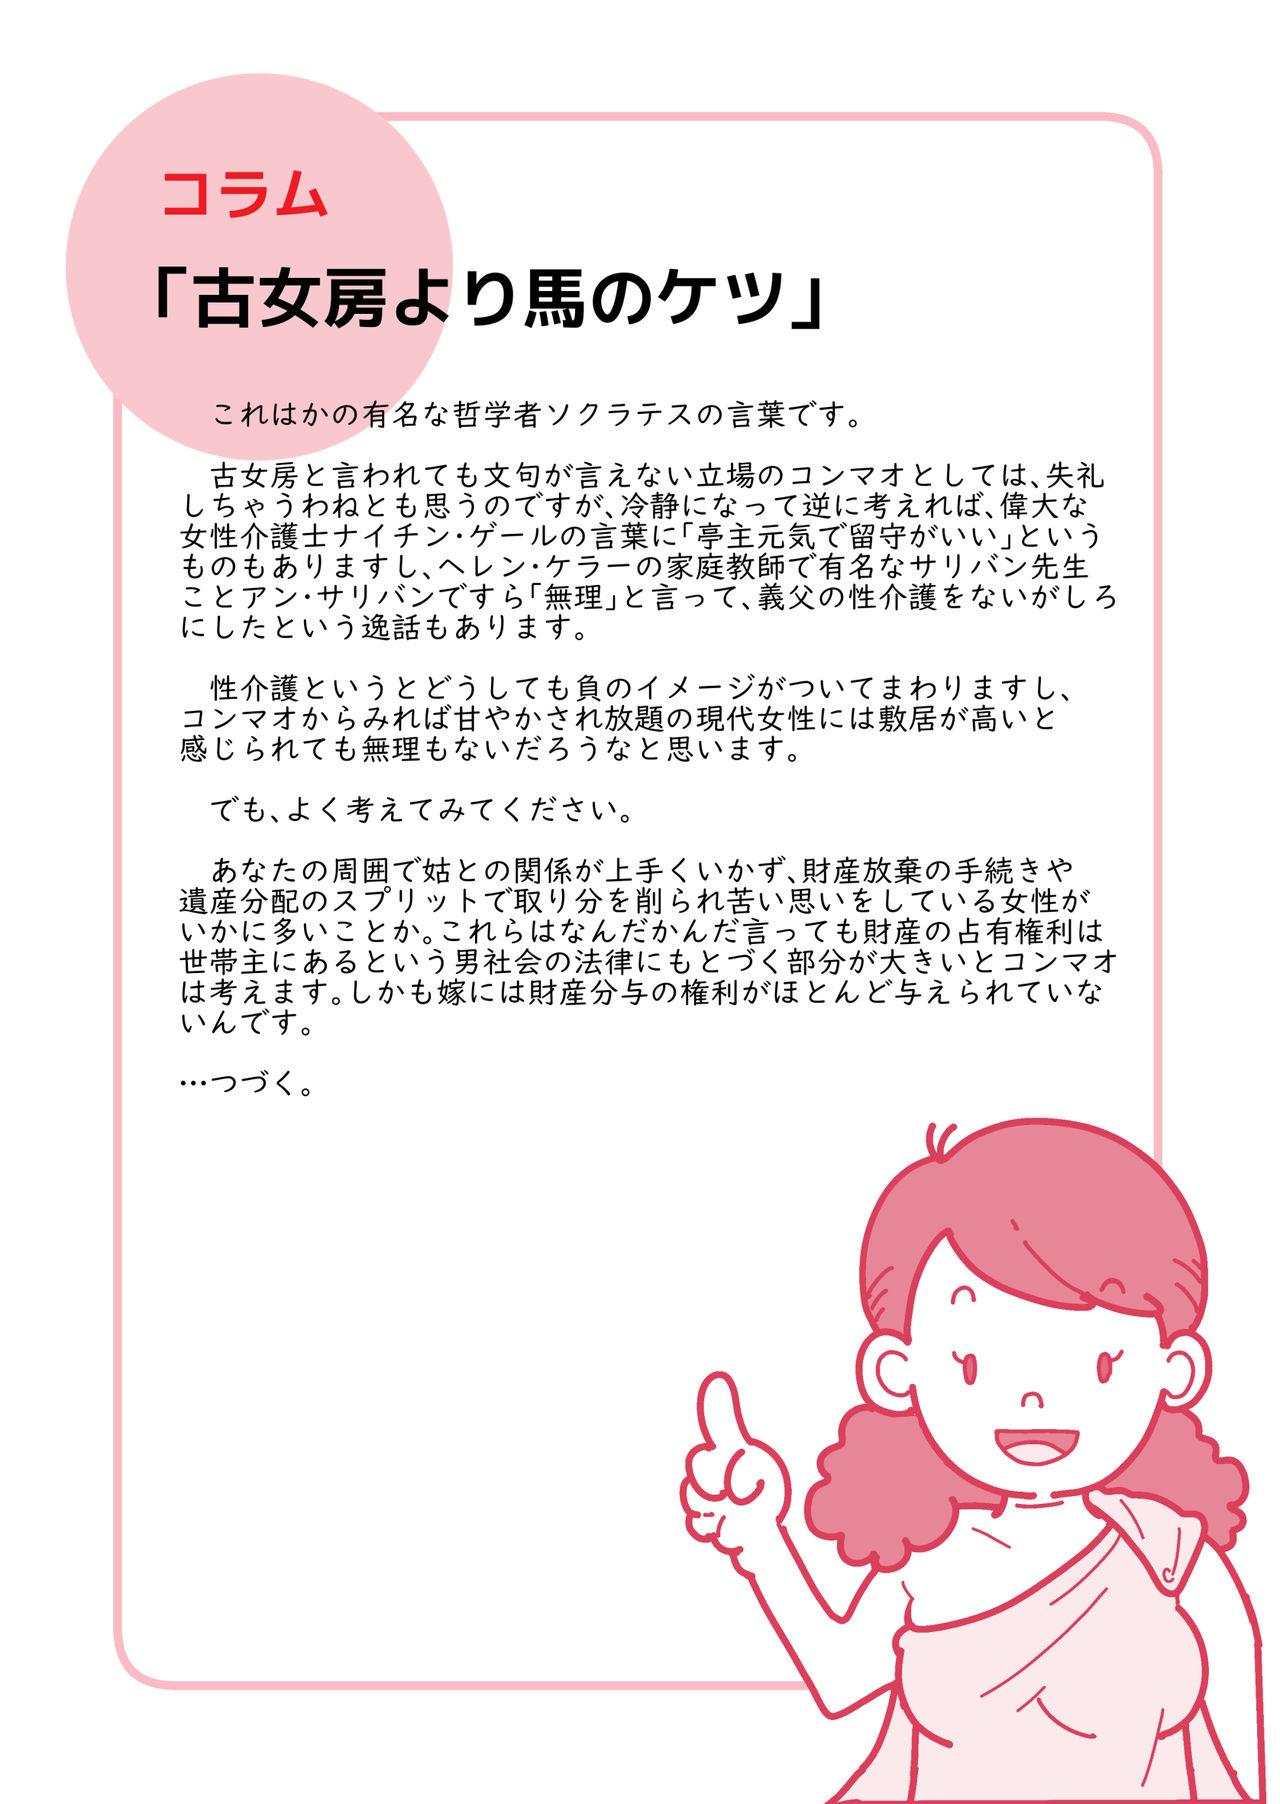 Isogasii Okaasan No Tamuno Sasa Rouzin Seikaigo | Guide for Elderly Sex Health Care to Busy Mom 37